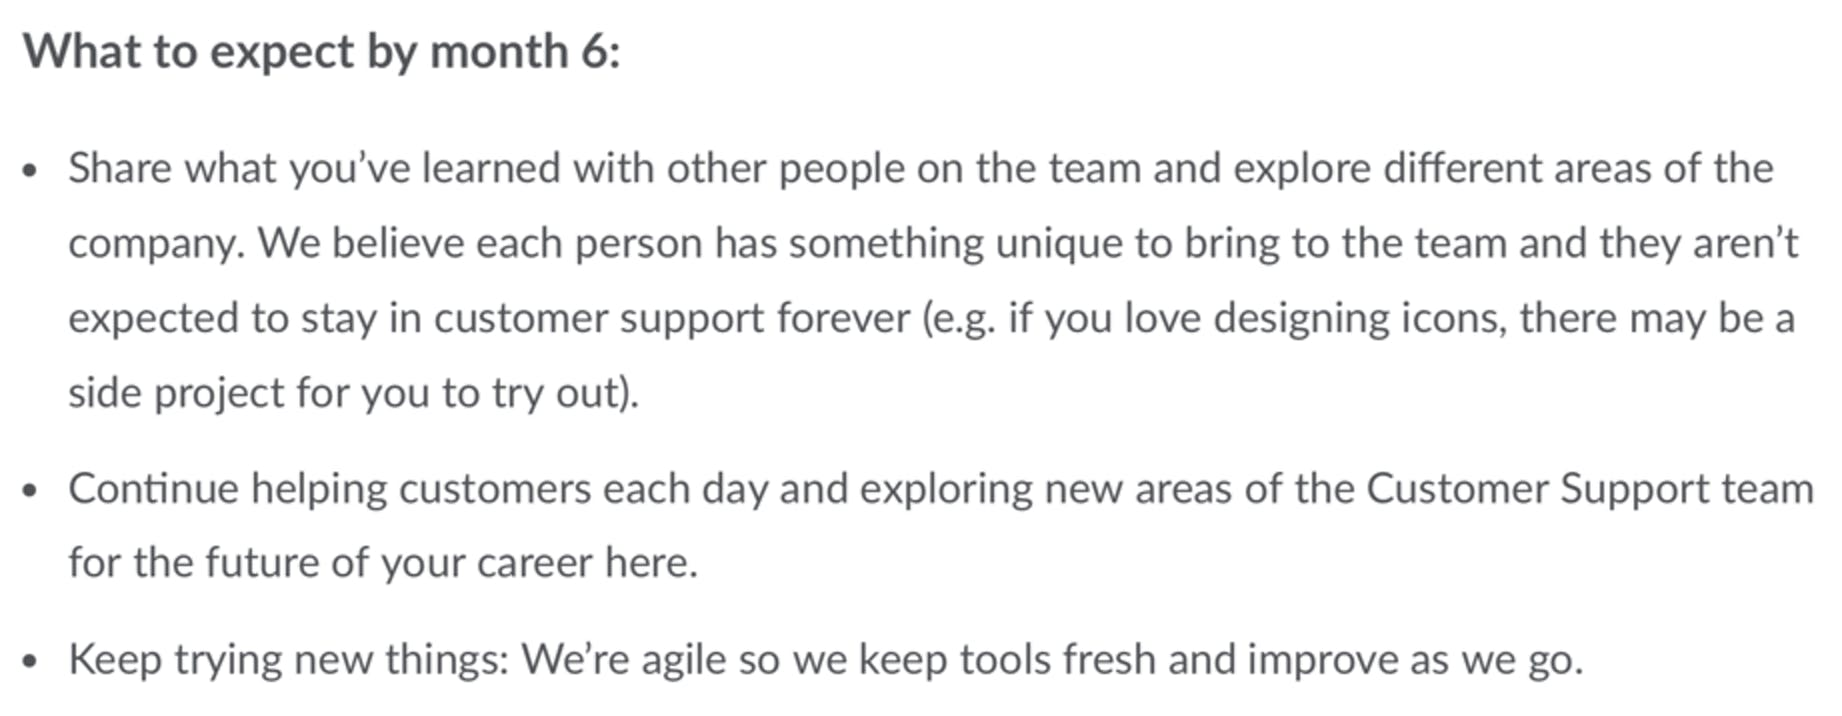 1password customer support representative job description